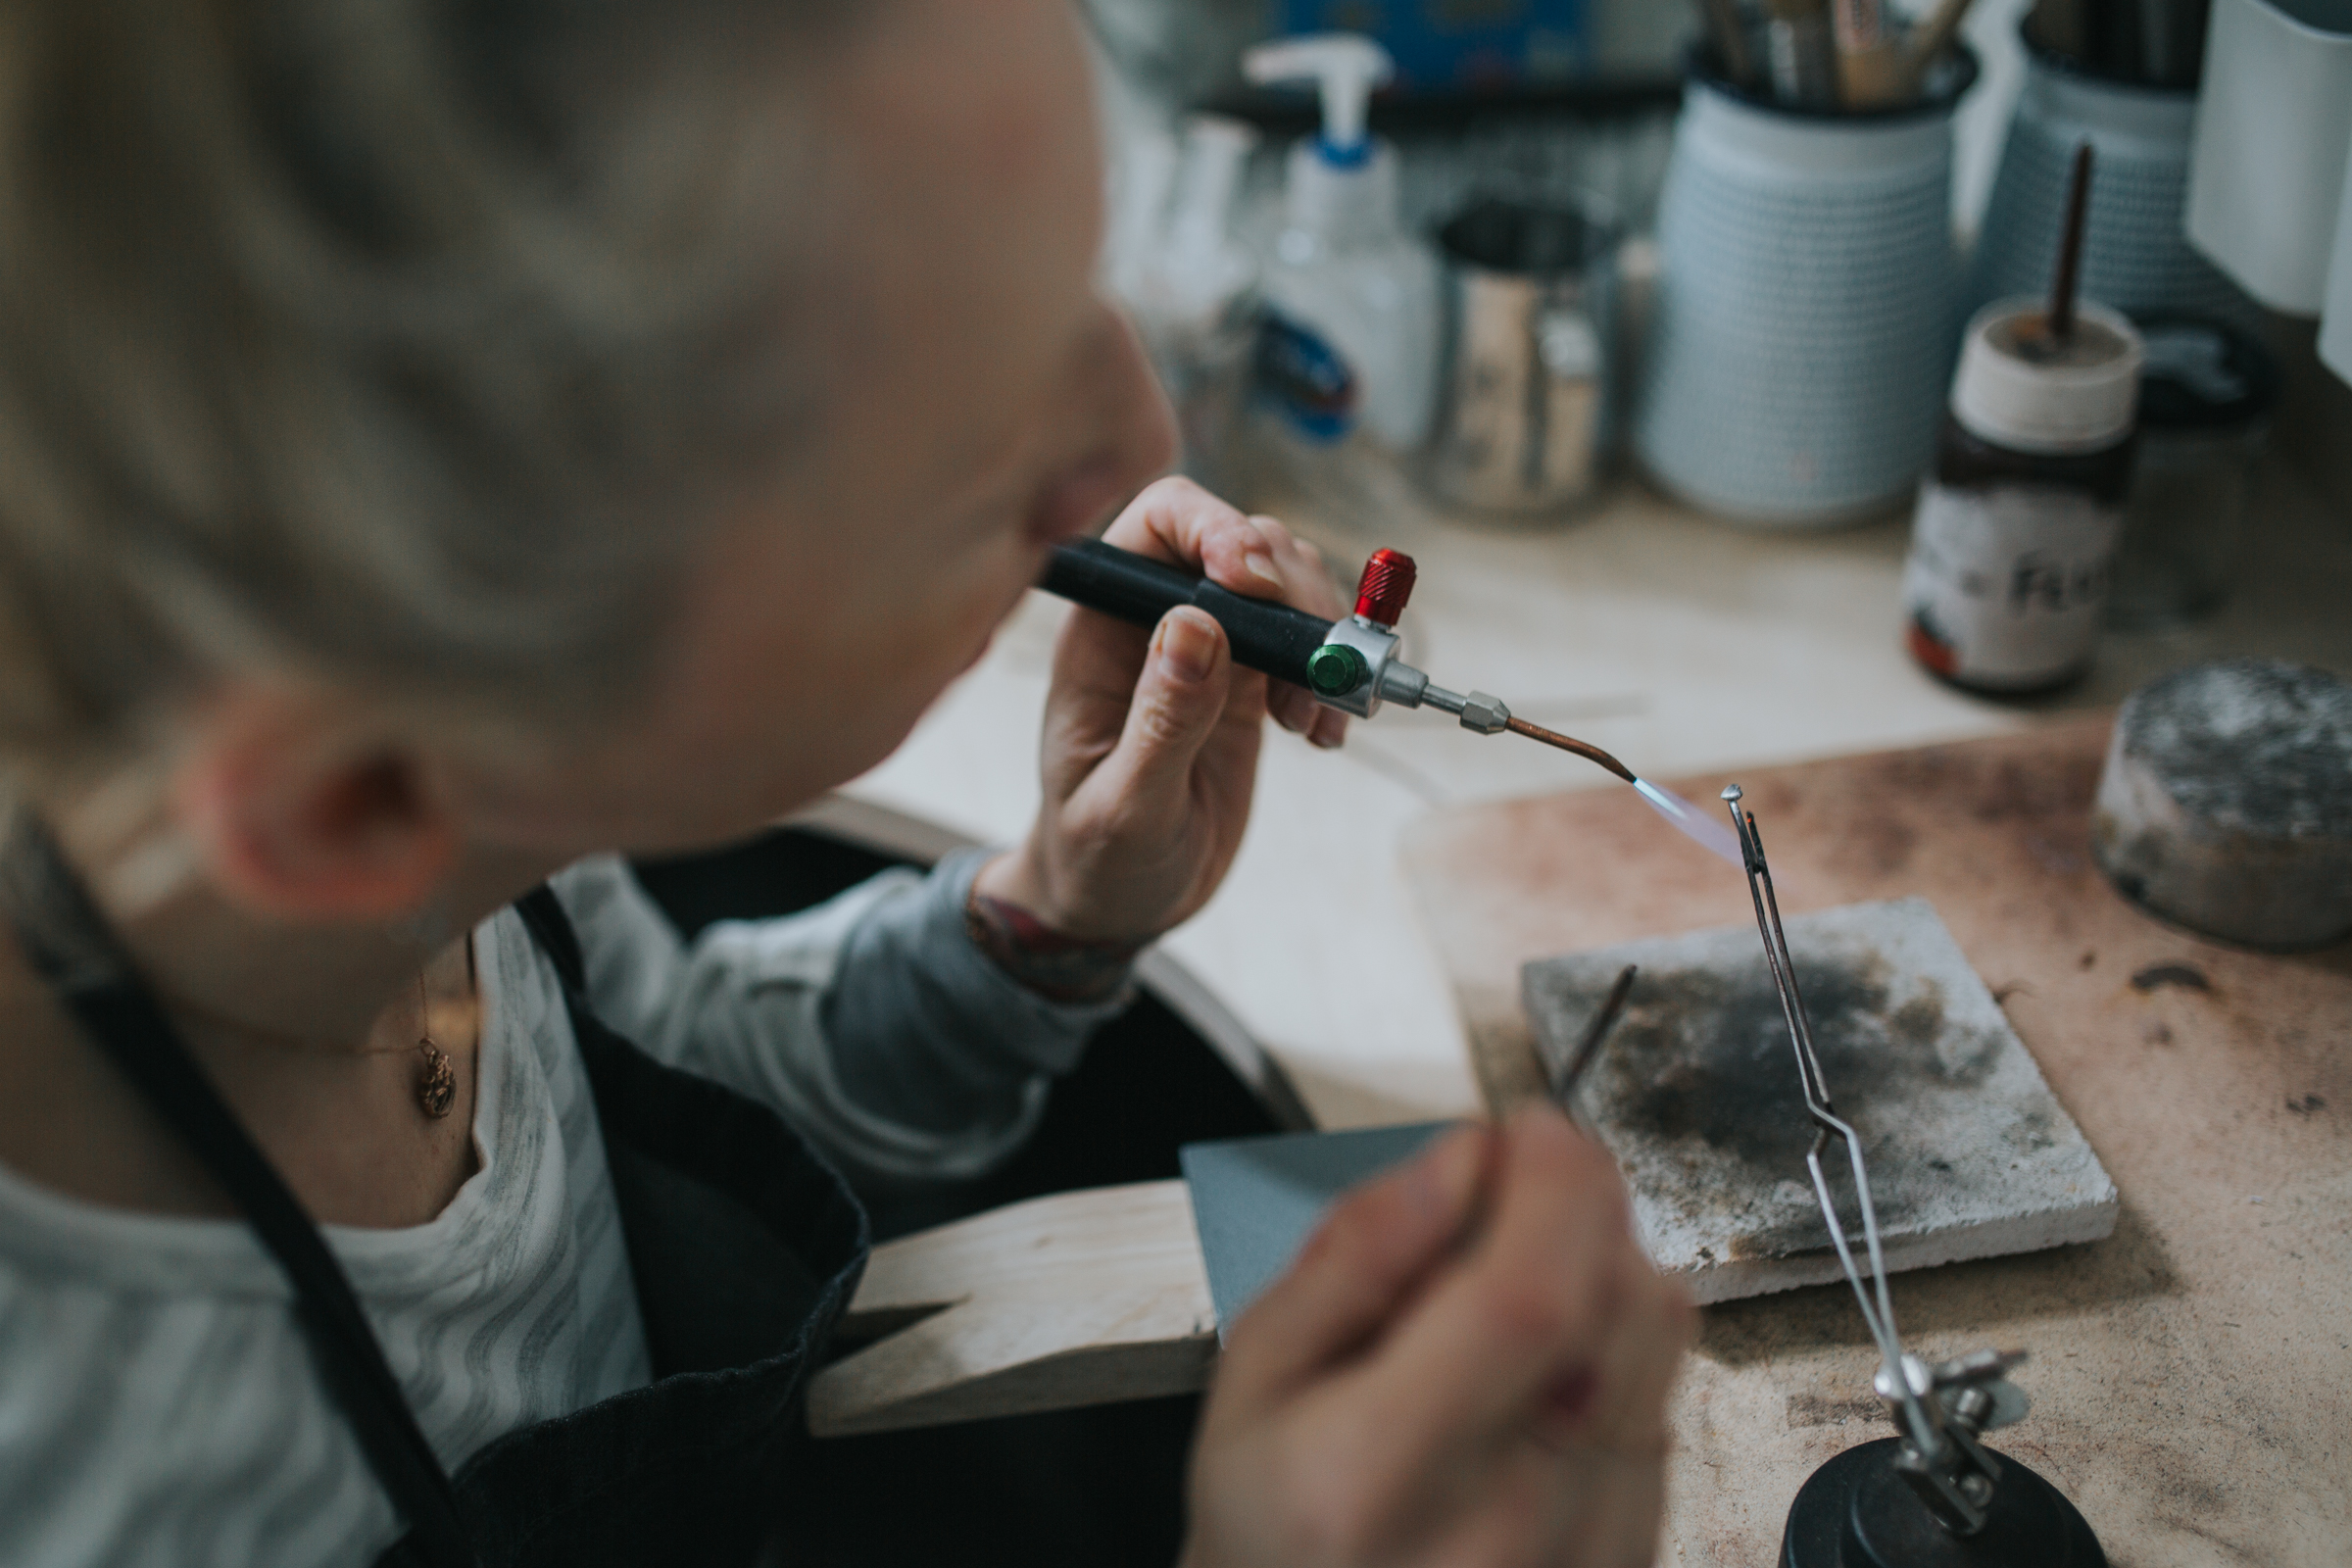 interview-jo-tootsievalentine-fine-designer-jewellery-fair-trade-gold-minas-planet-jasmina-haskovic-london-uk13.jpg